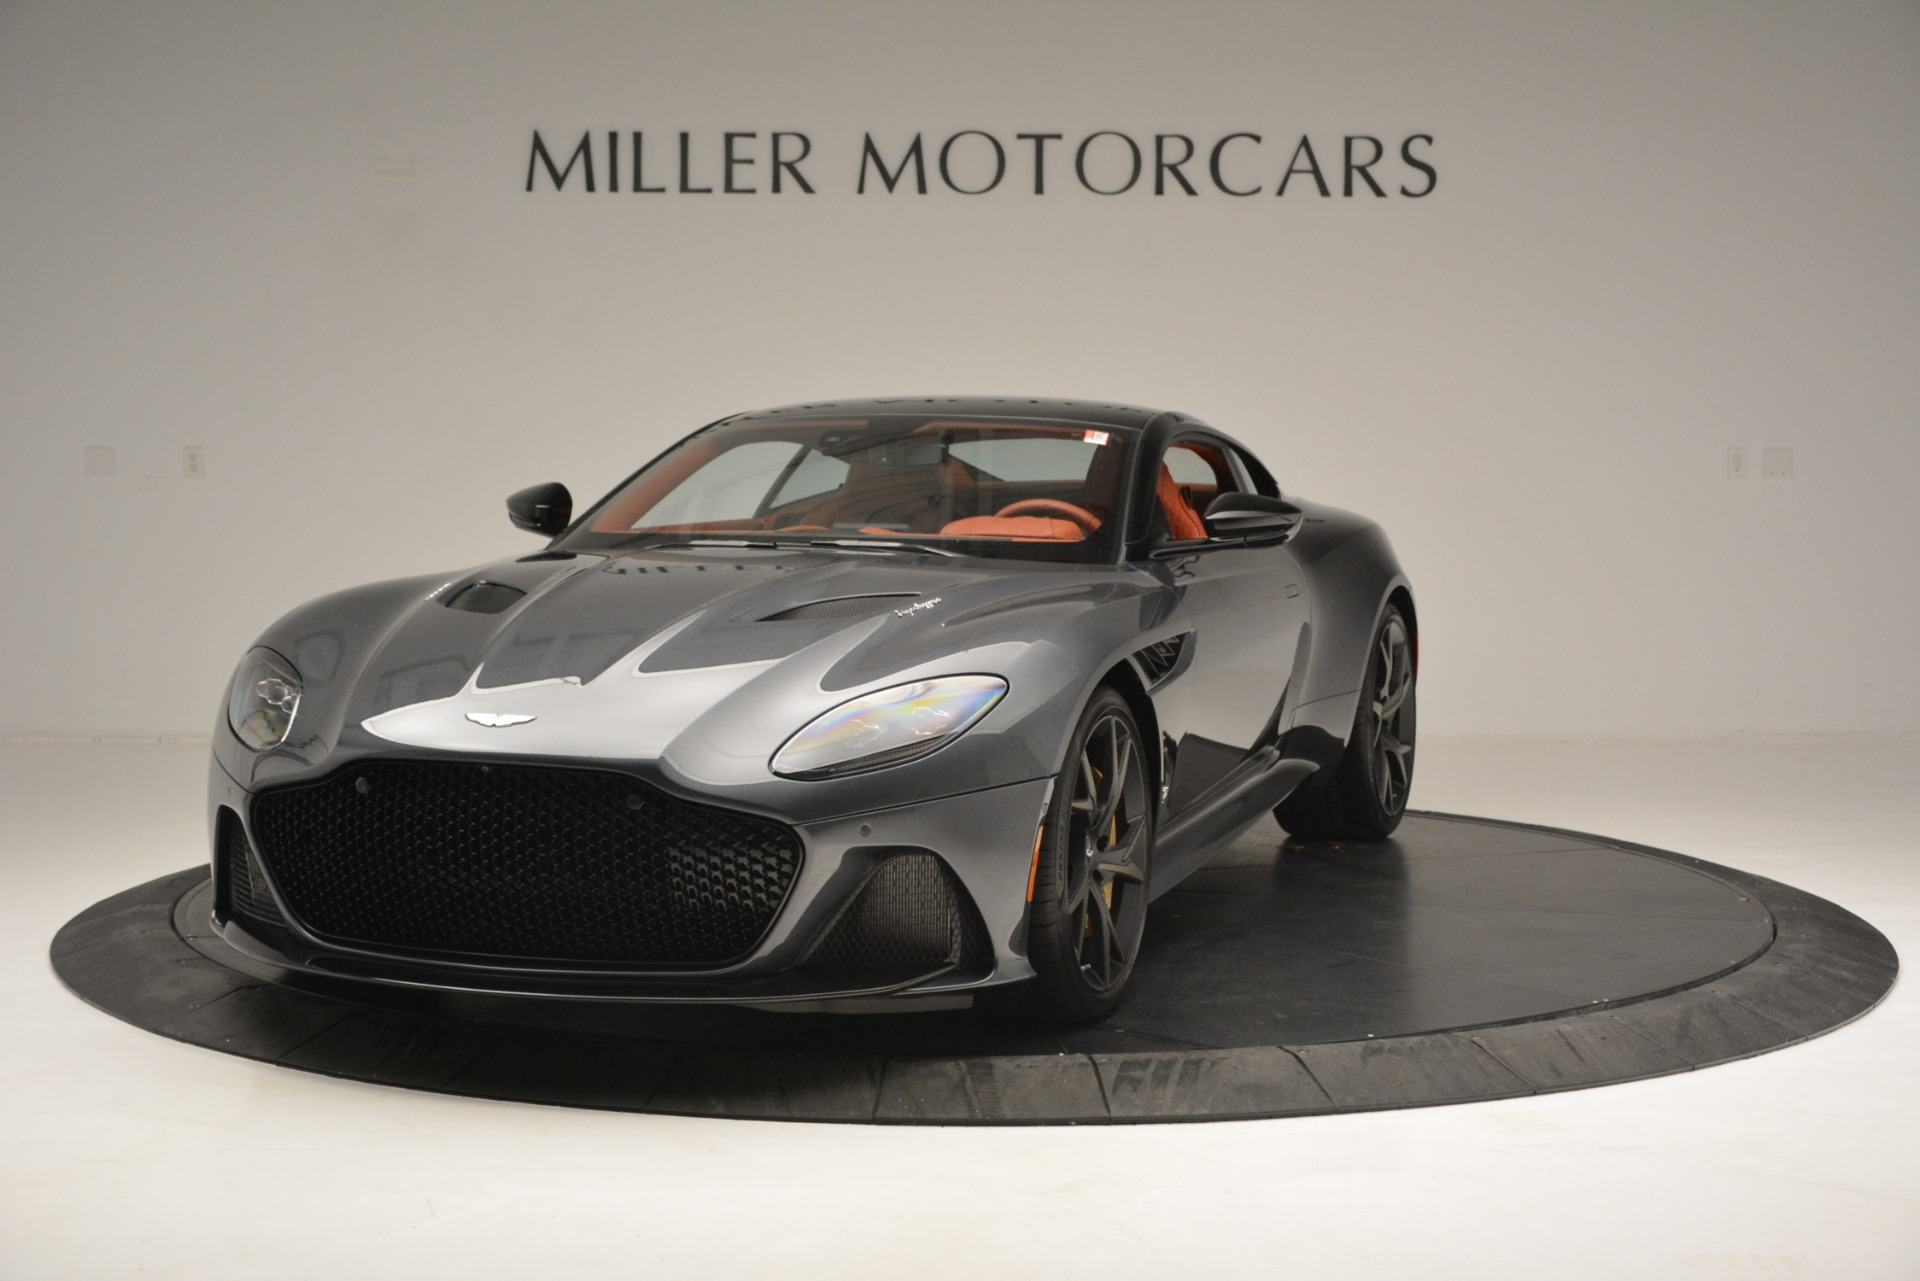 New 2019 Aston Martin DBS Superleggera For Sale In Greenwich, CT 2827_p2